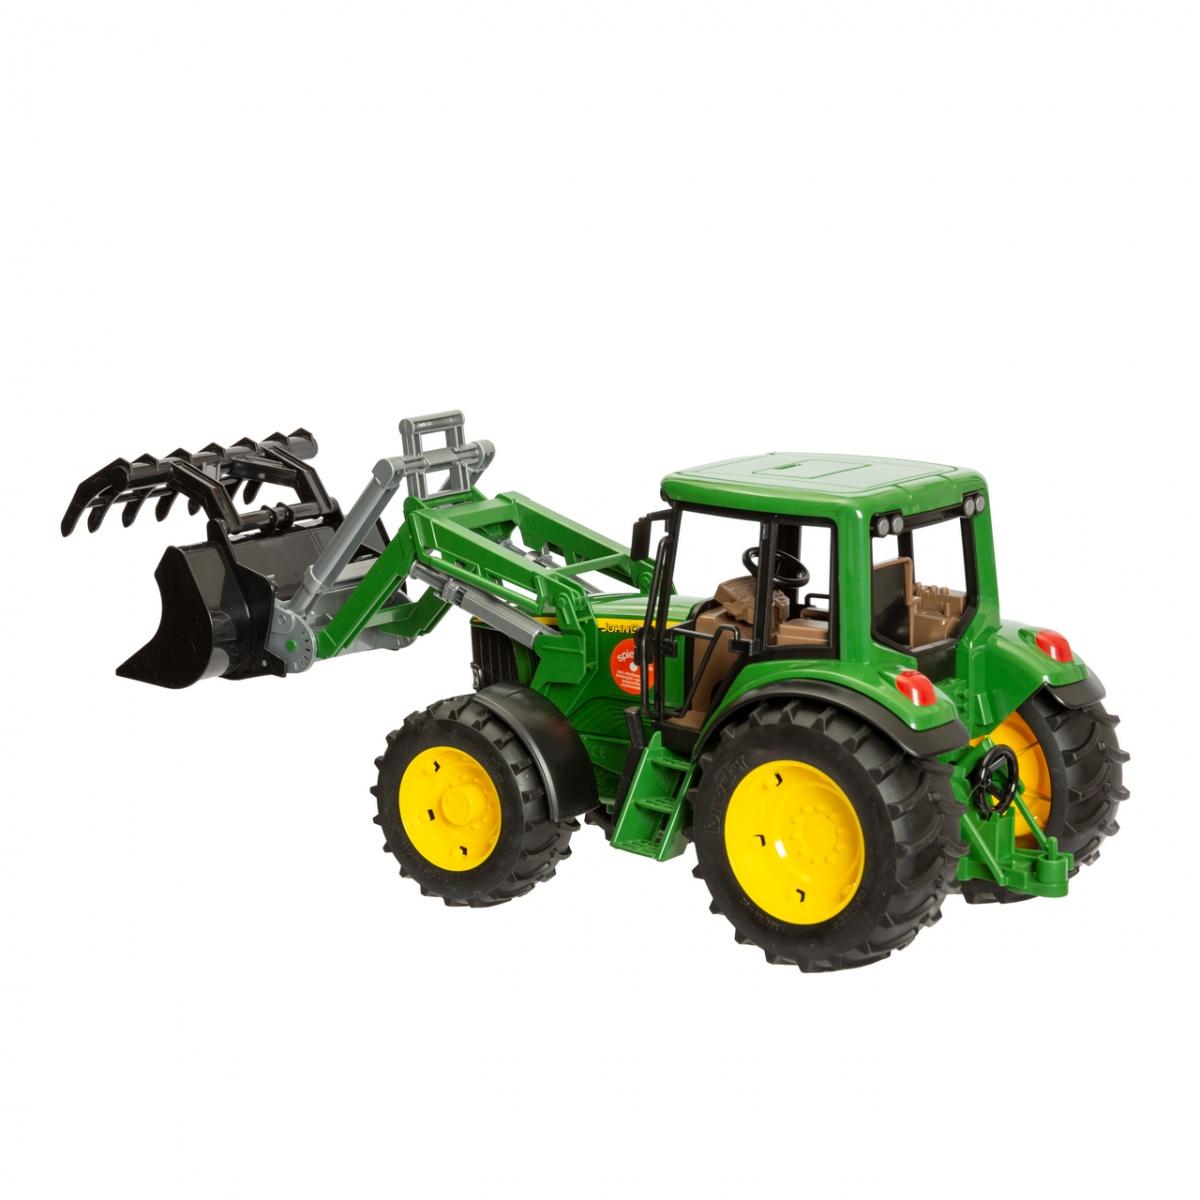 John Deere 6920 játéktraktor rakodókarral